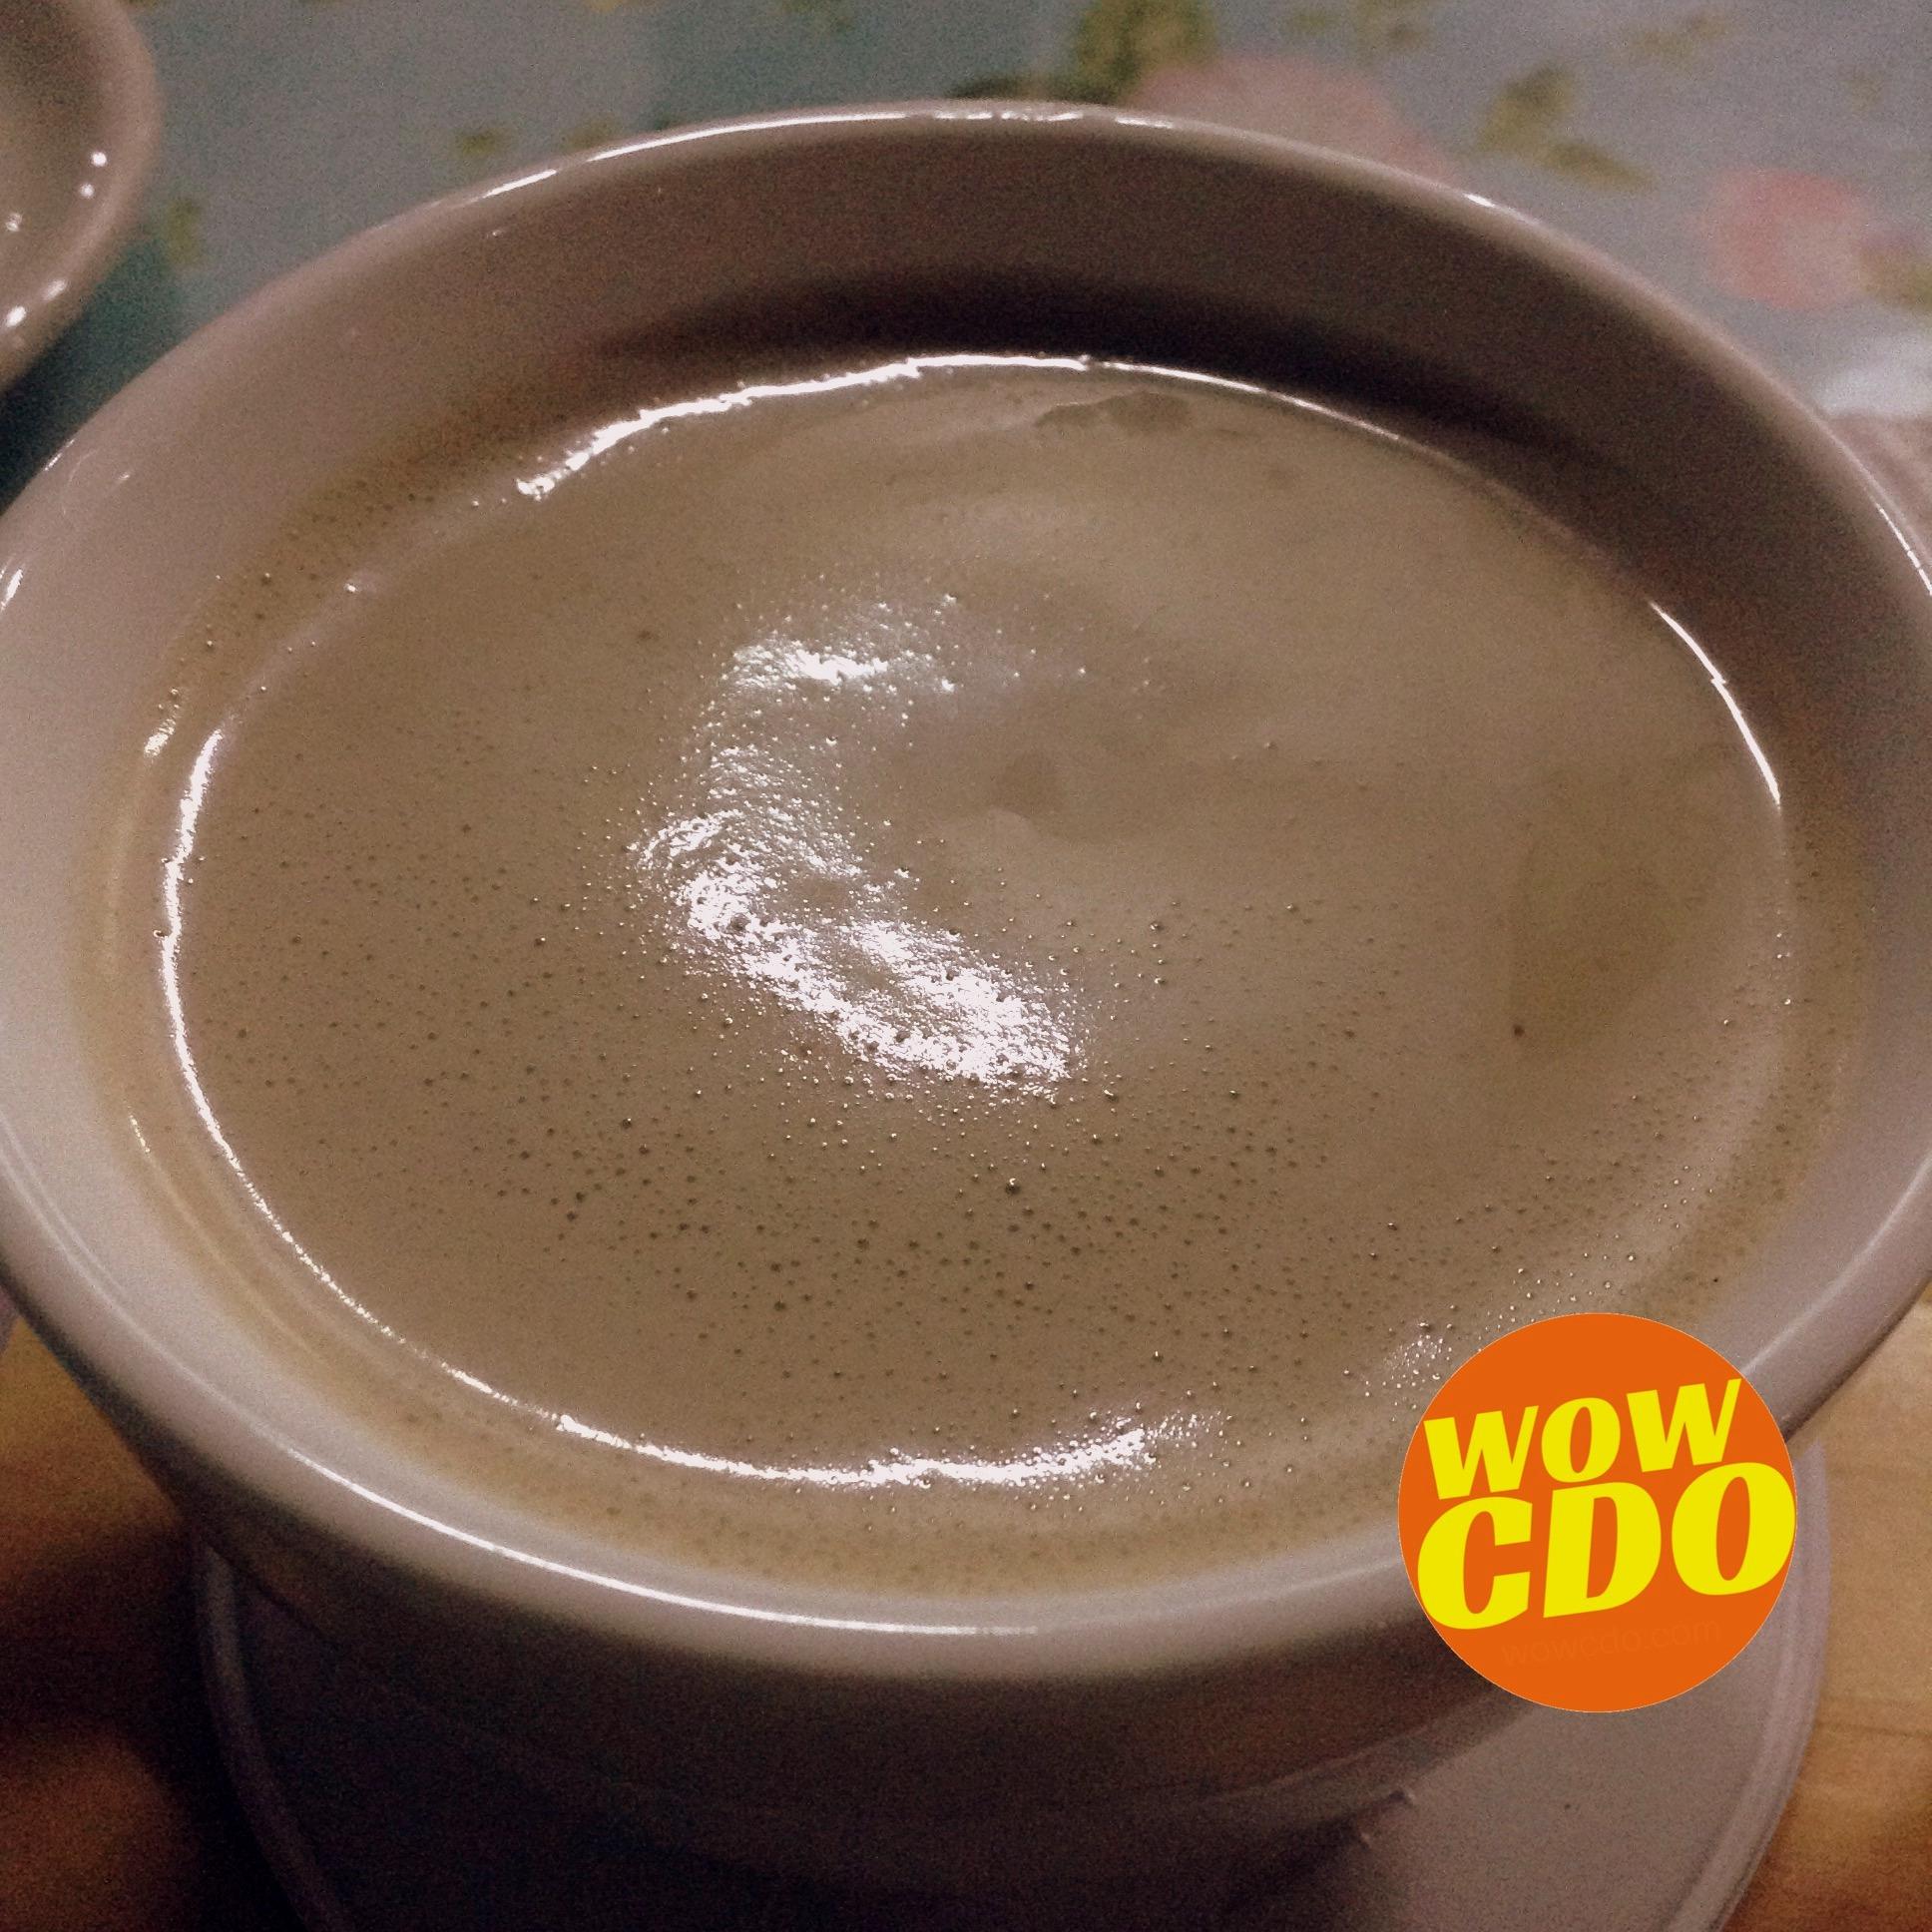 pane-e-dolci-chai-latte-cdo